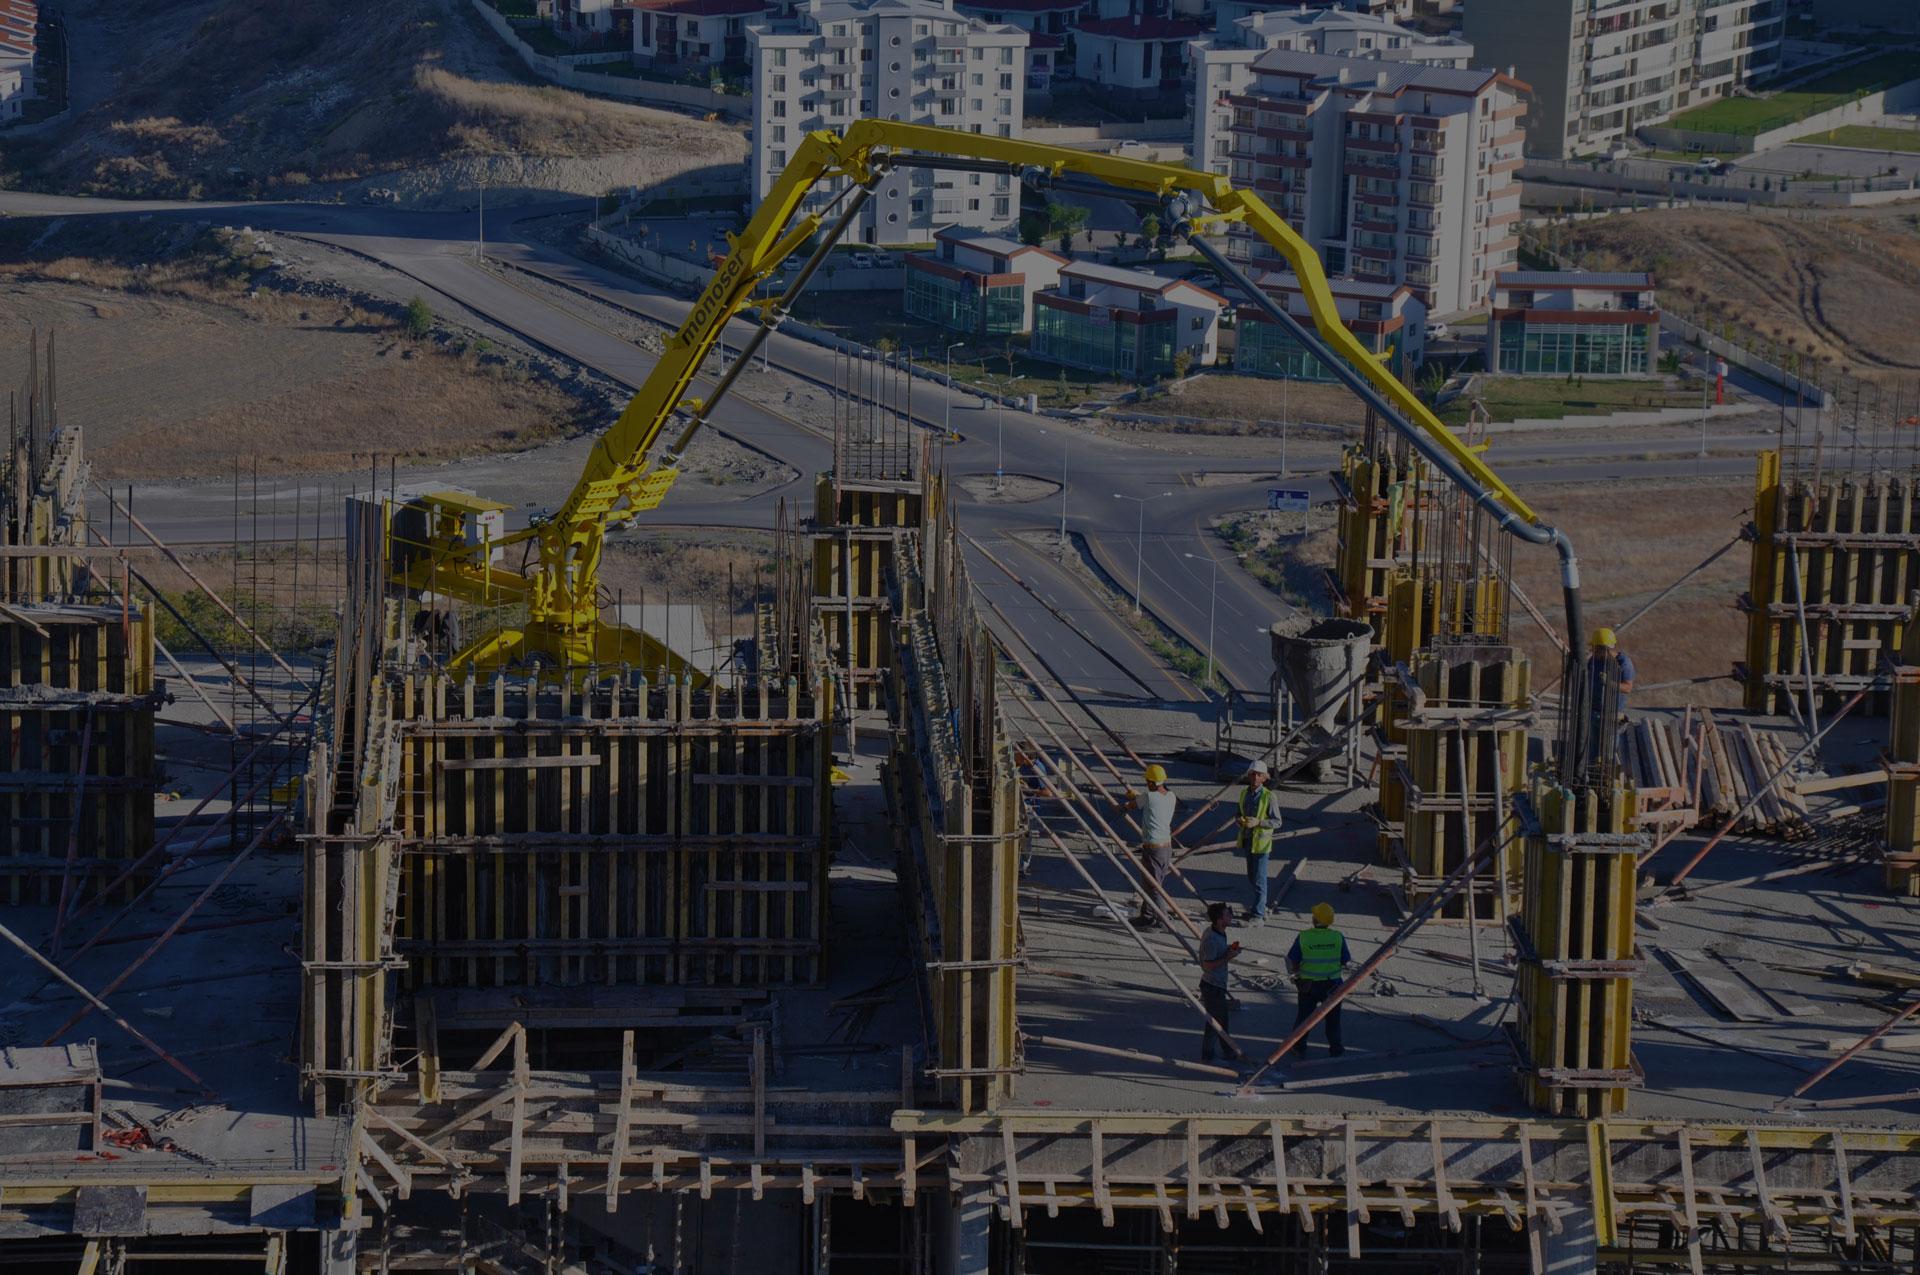 monoser PB18 concrete placing boom